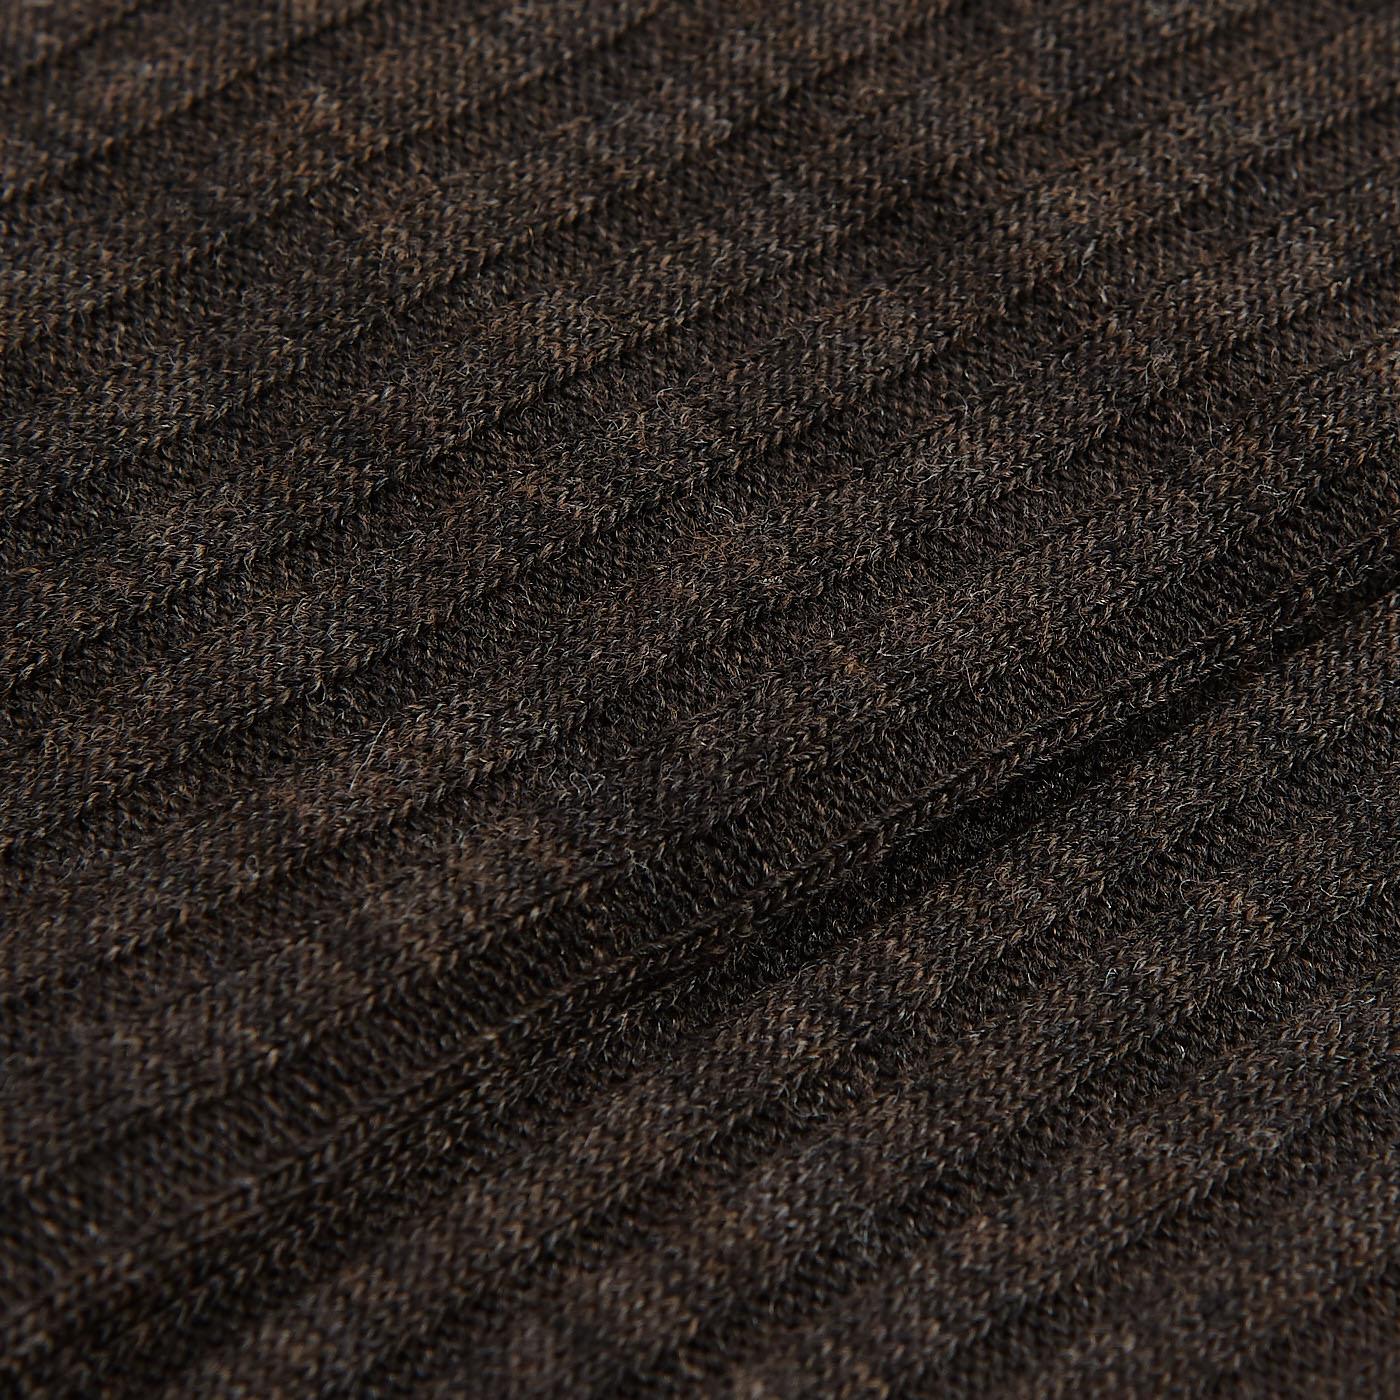 Pantherella Brown Merino Wool Ribbed Knee Socks Fabric